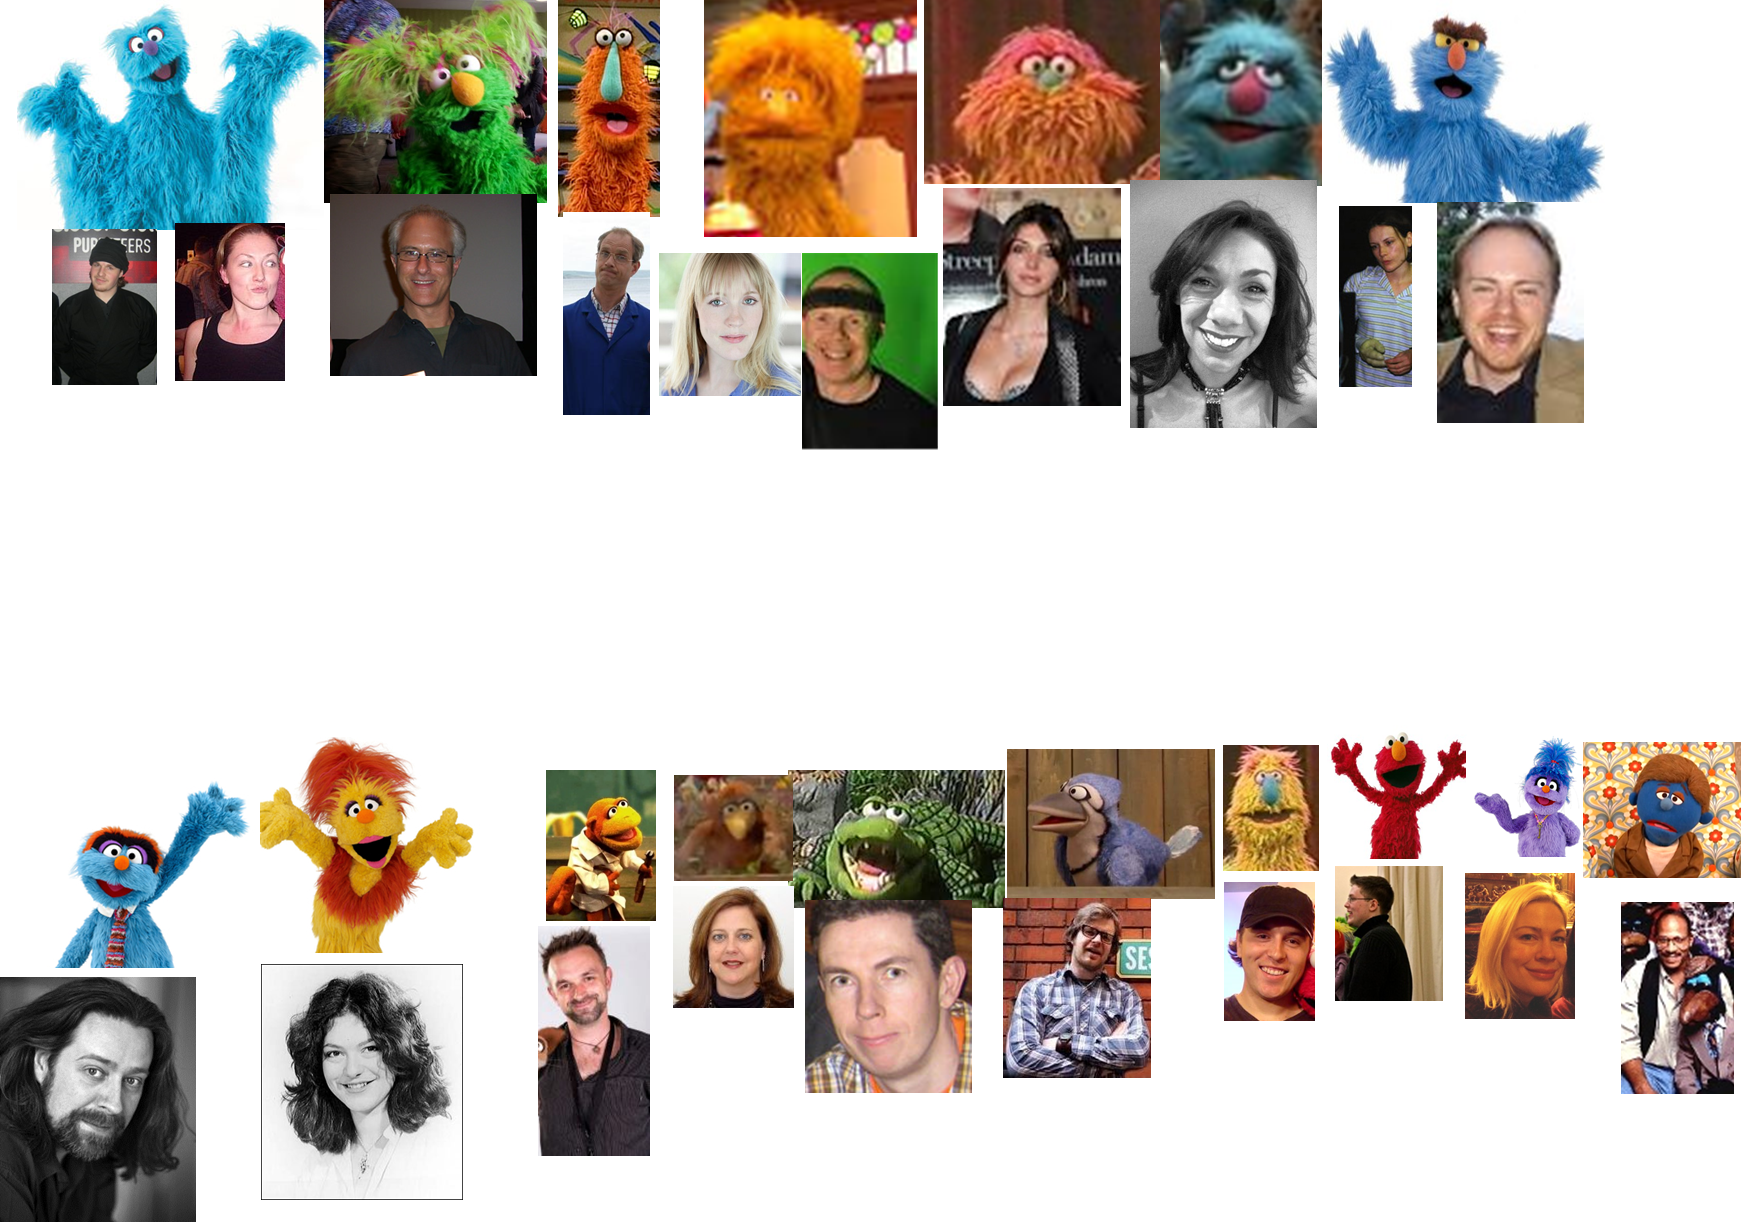 Image - Muppet wiki Behind the scenes Sesame Street Elmopalooza ...